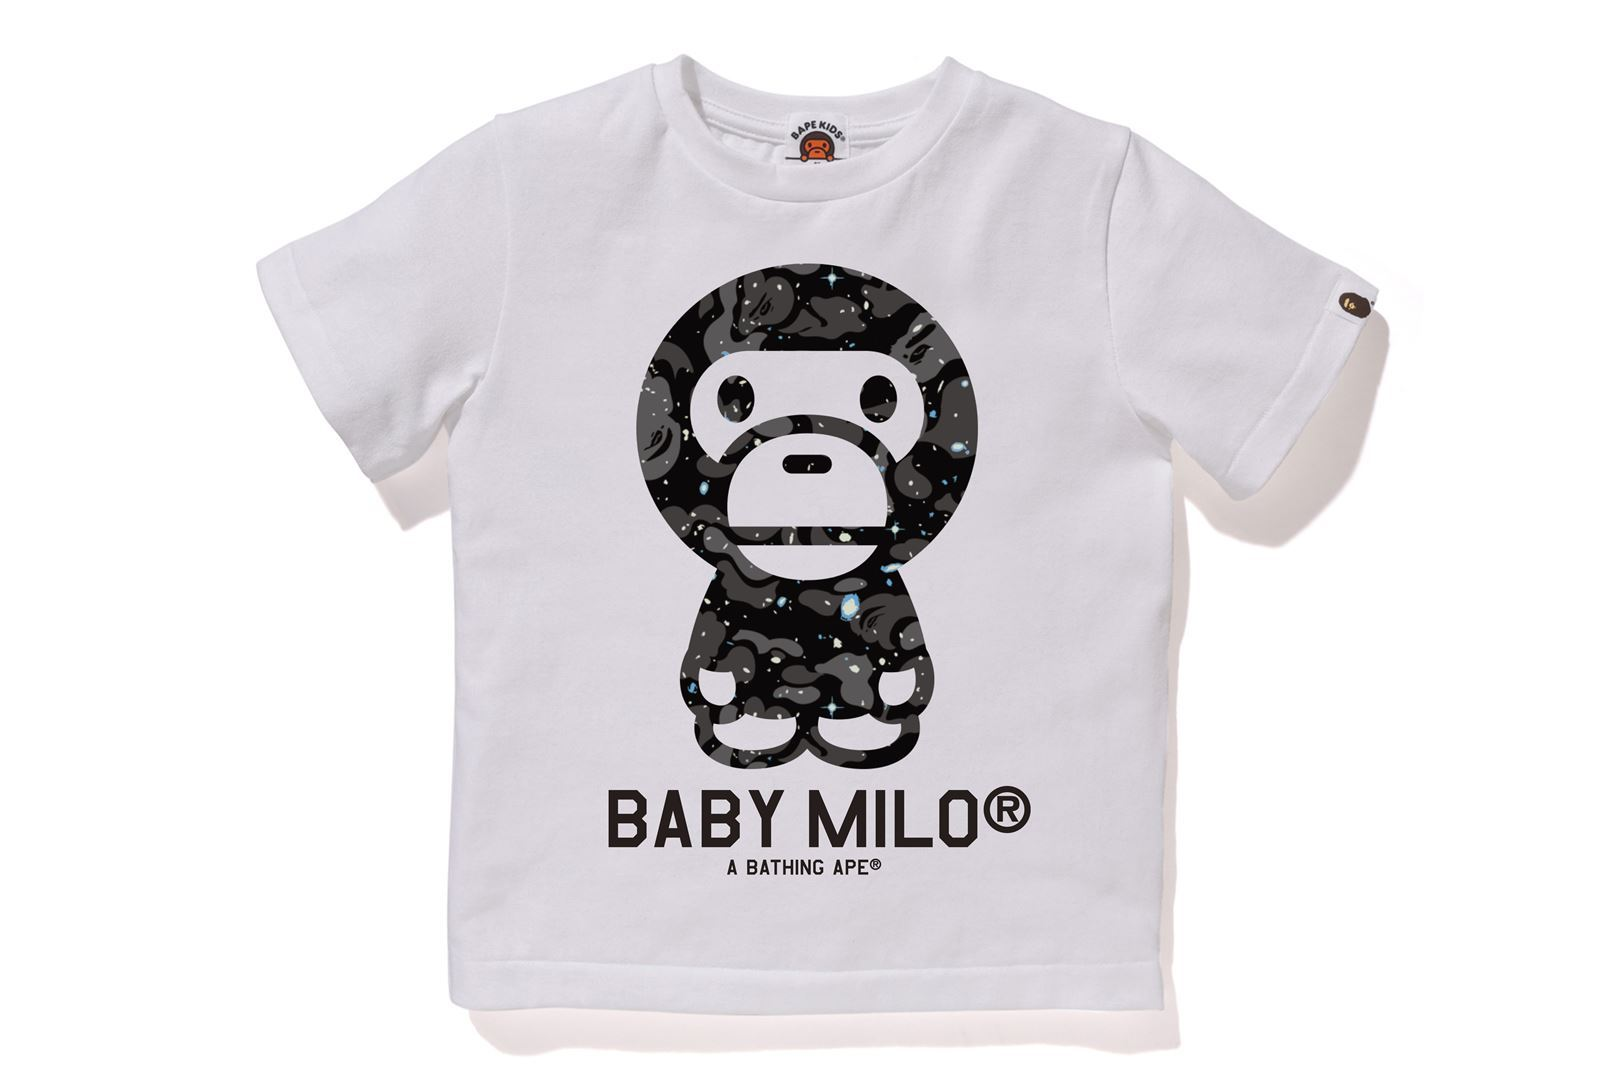 SPACE CAMO BABY MILO® TEE_a0174495_17402593.jpg